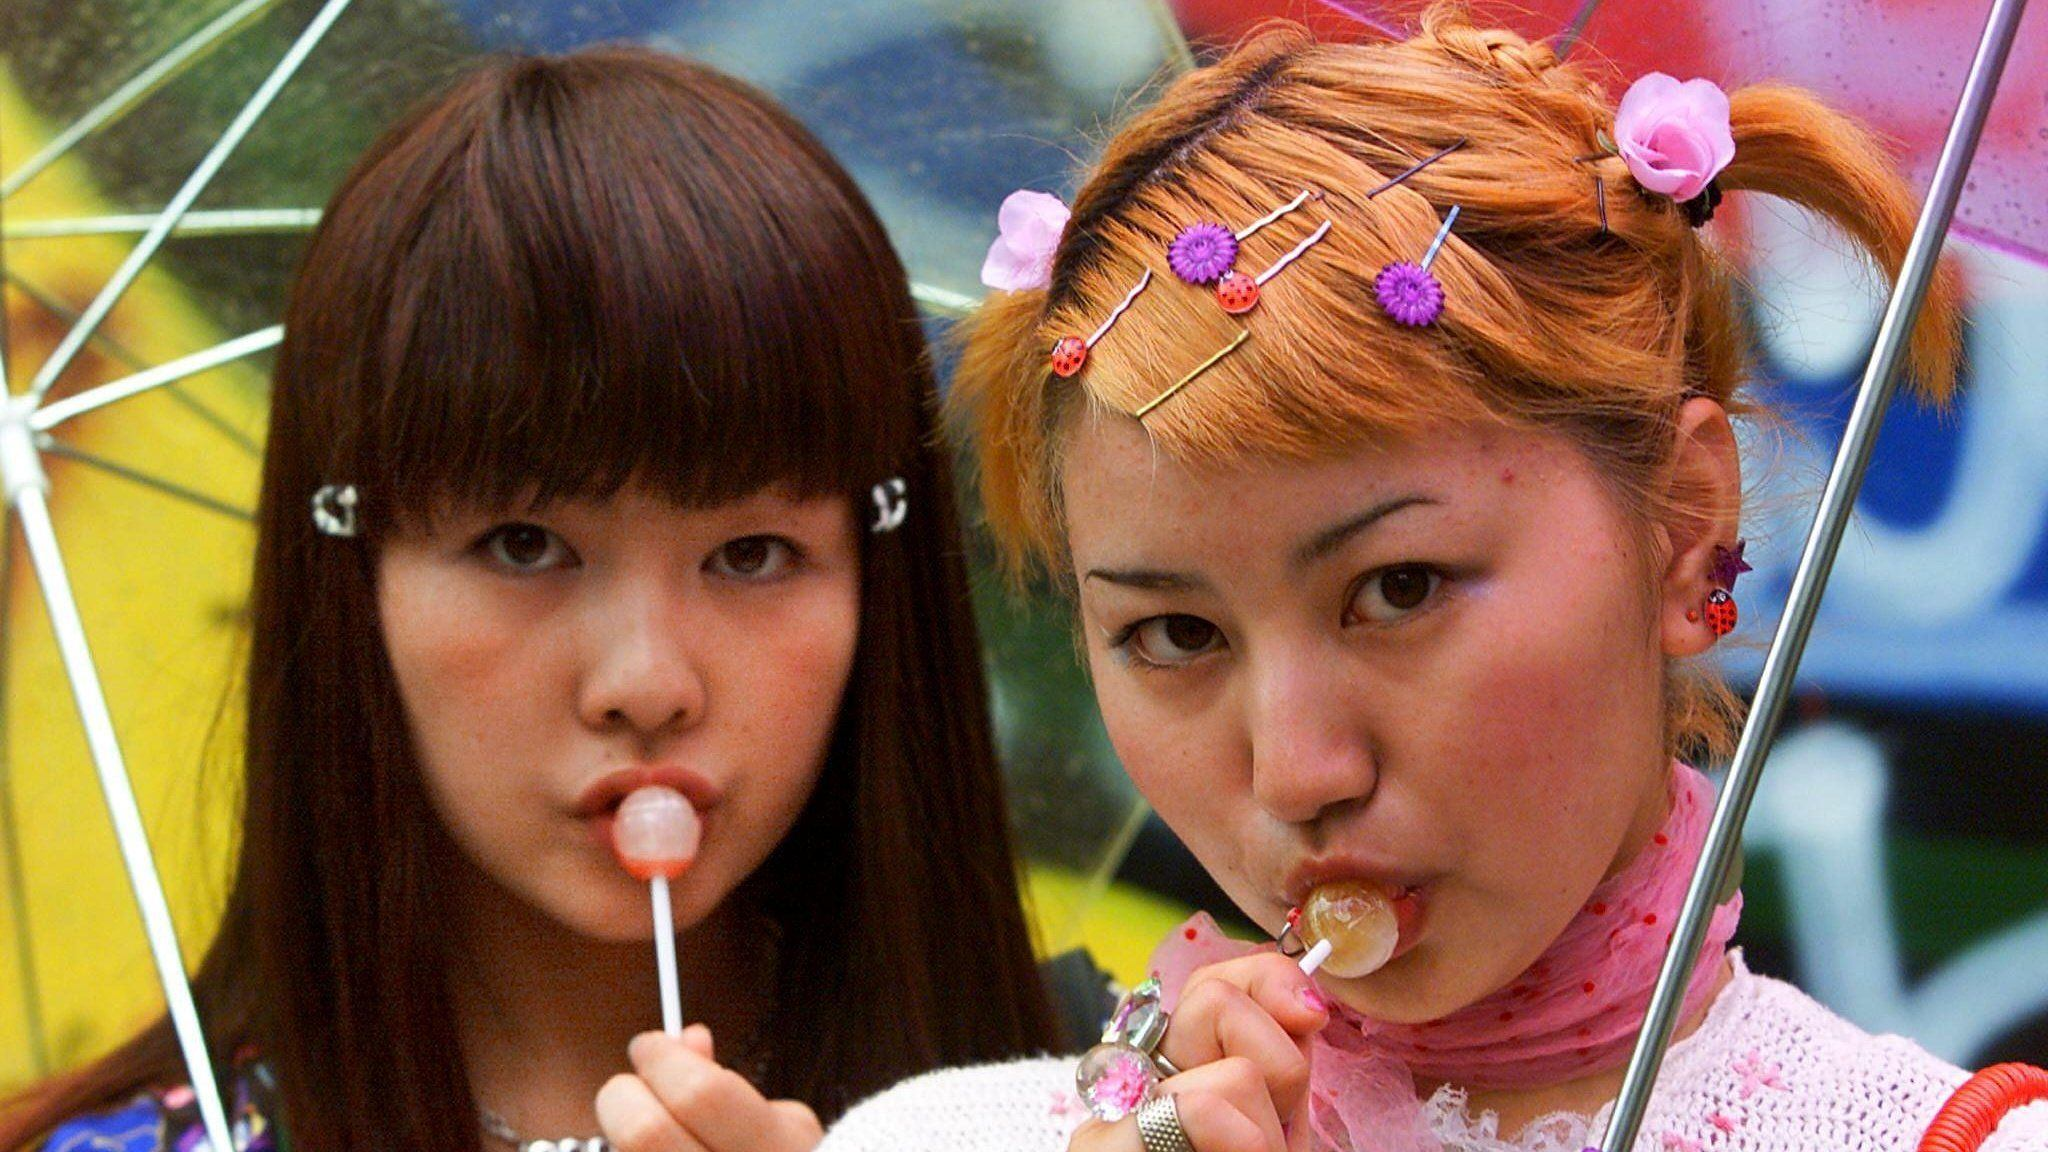 Photos hairy tokyo teens 18 Hairy